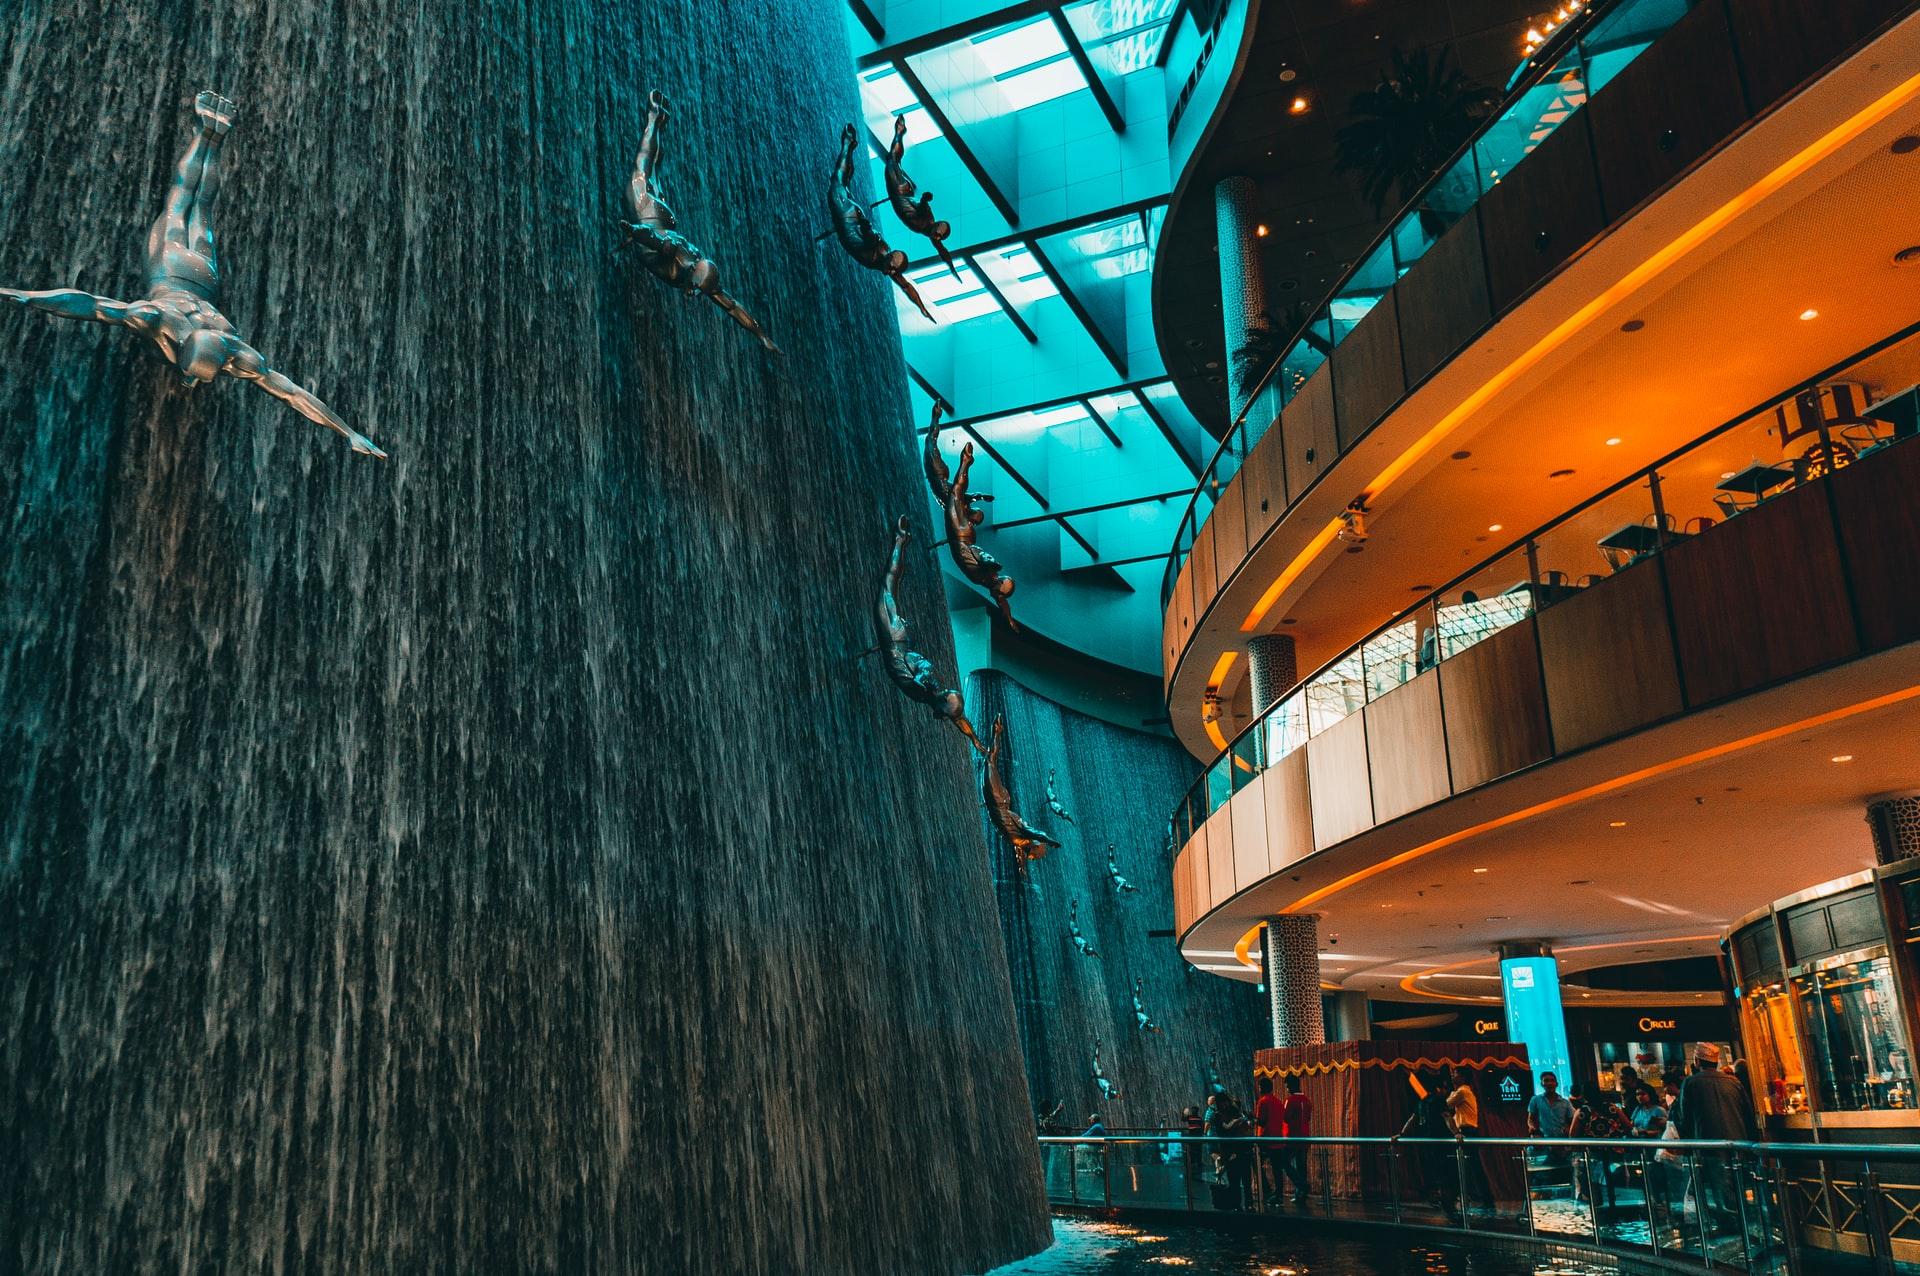 Dubai Mall Xplore Dubai